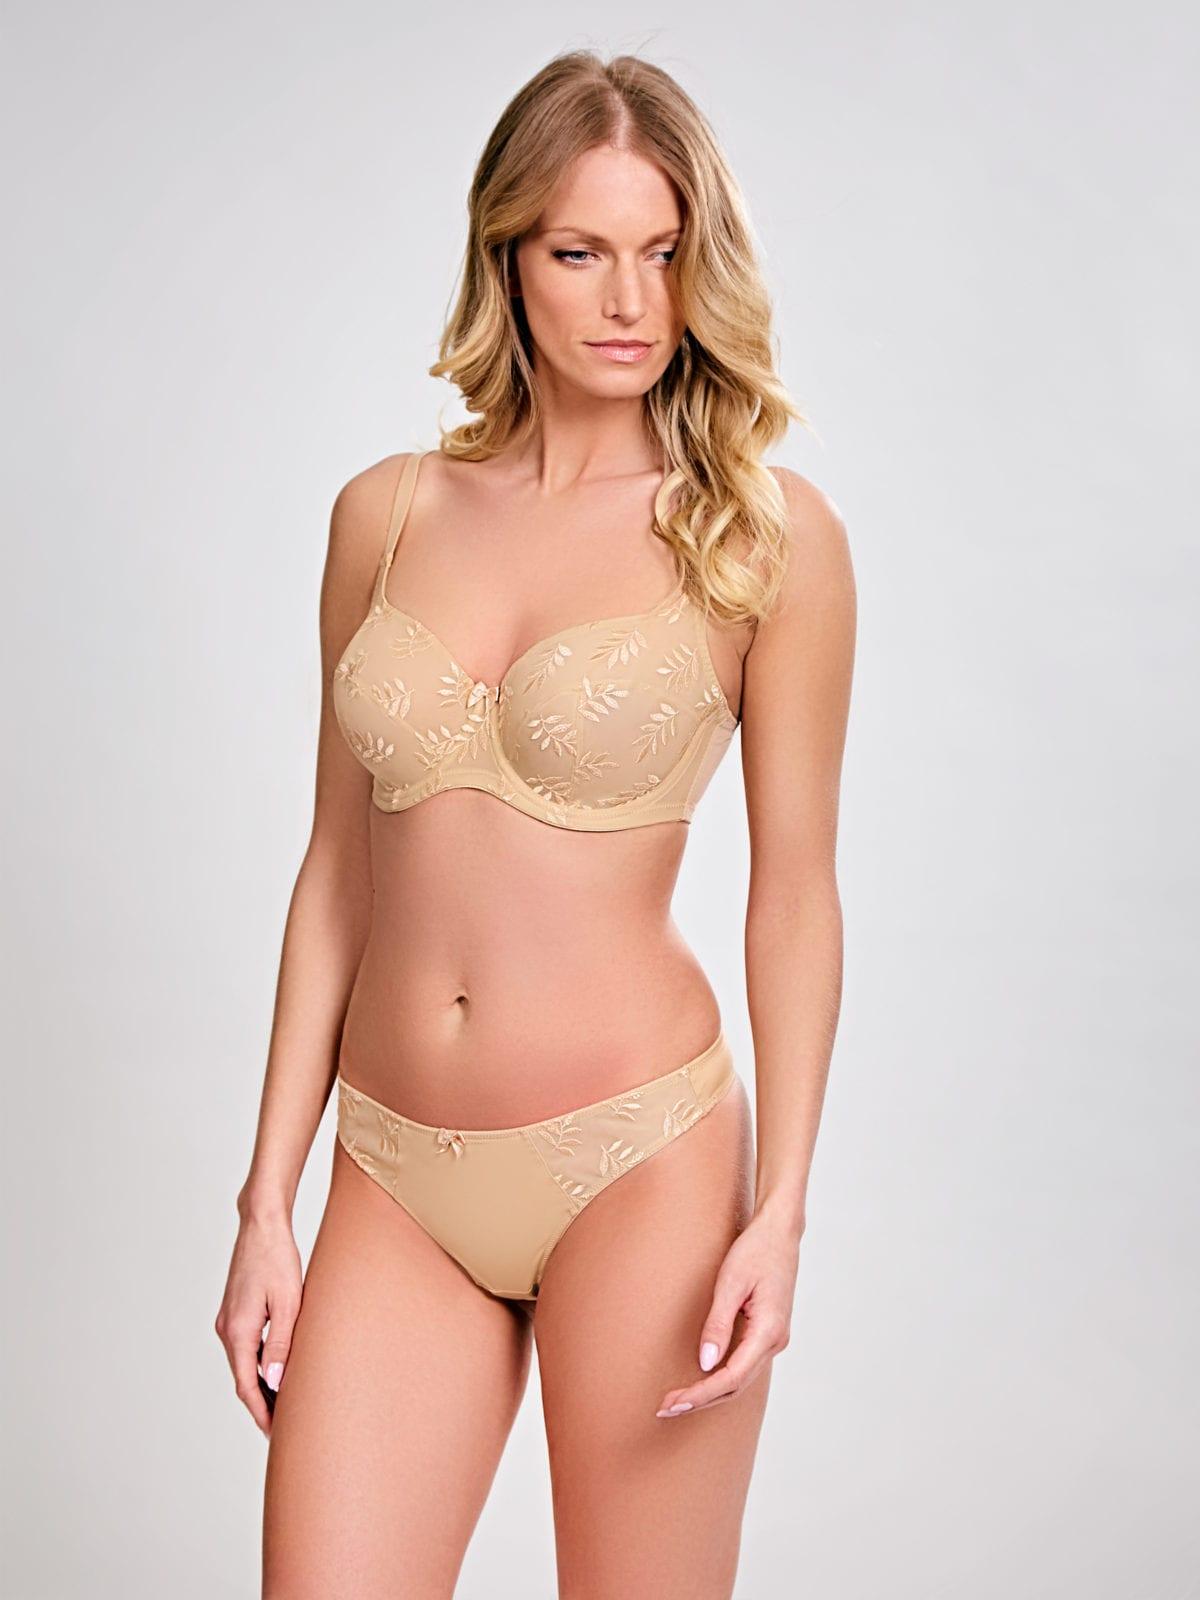 Базовое белье 3251_208_Tango Balconnet Bra Nude Front Trade 5